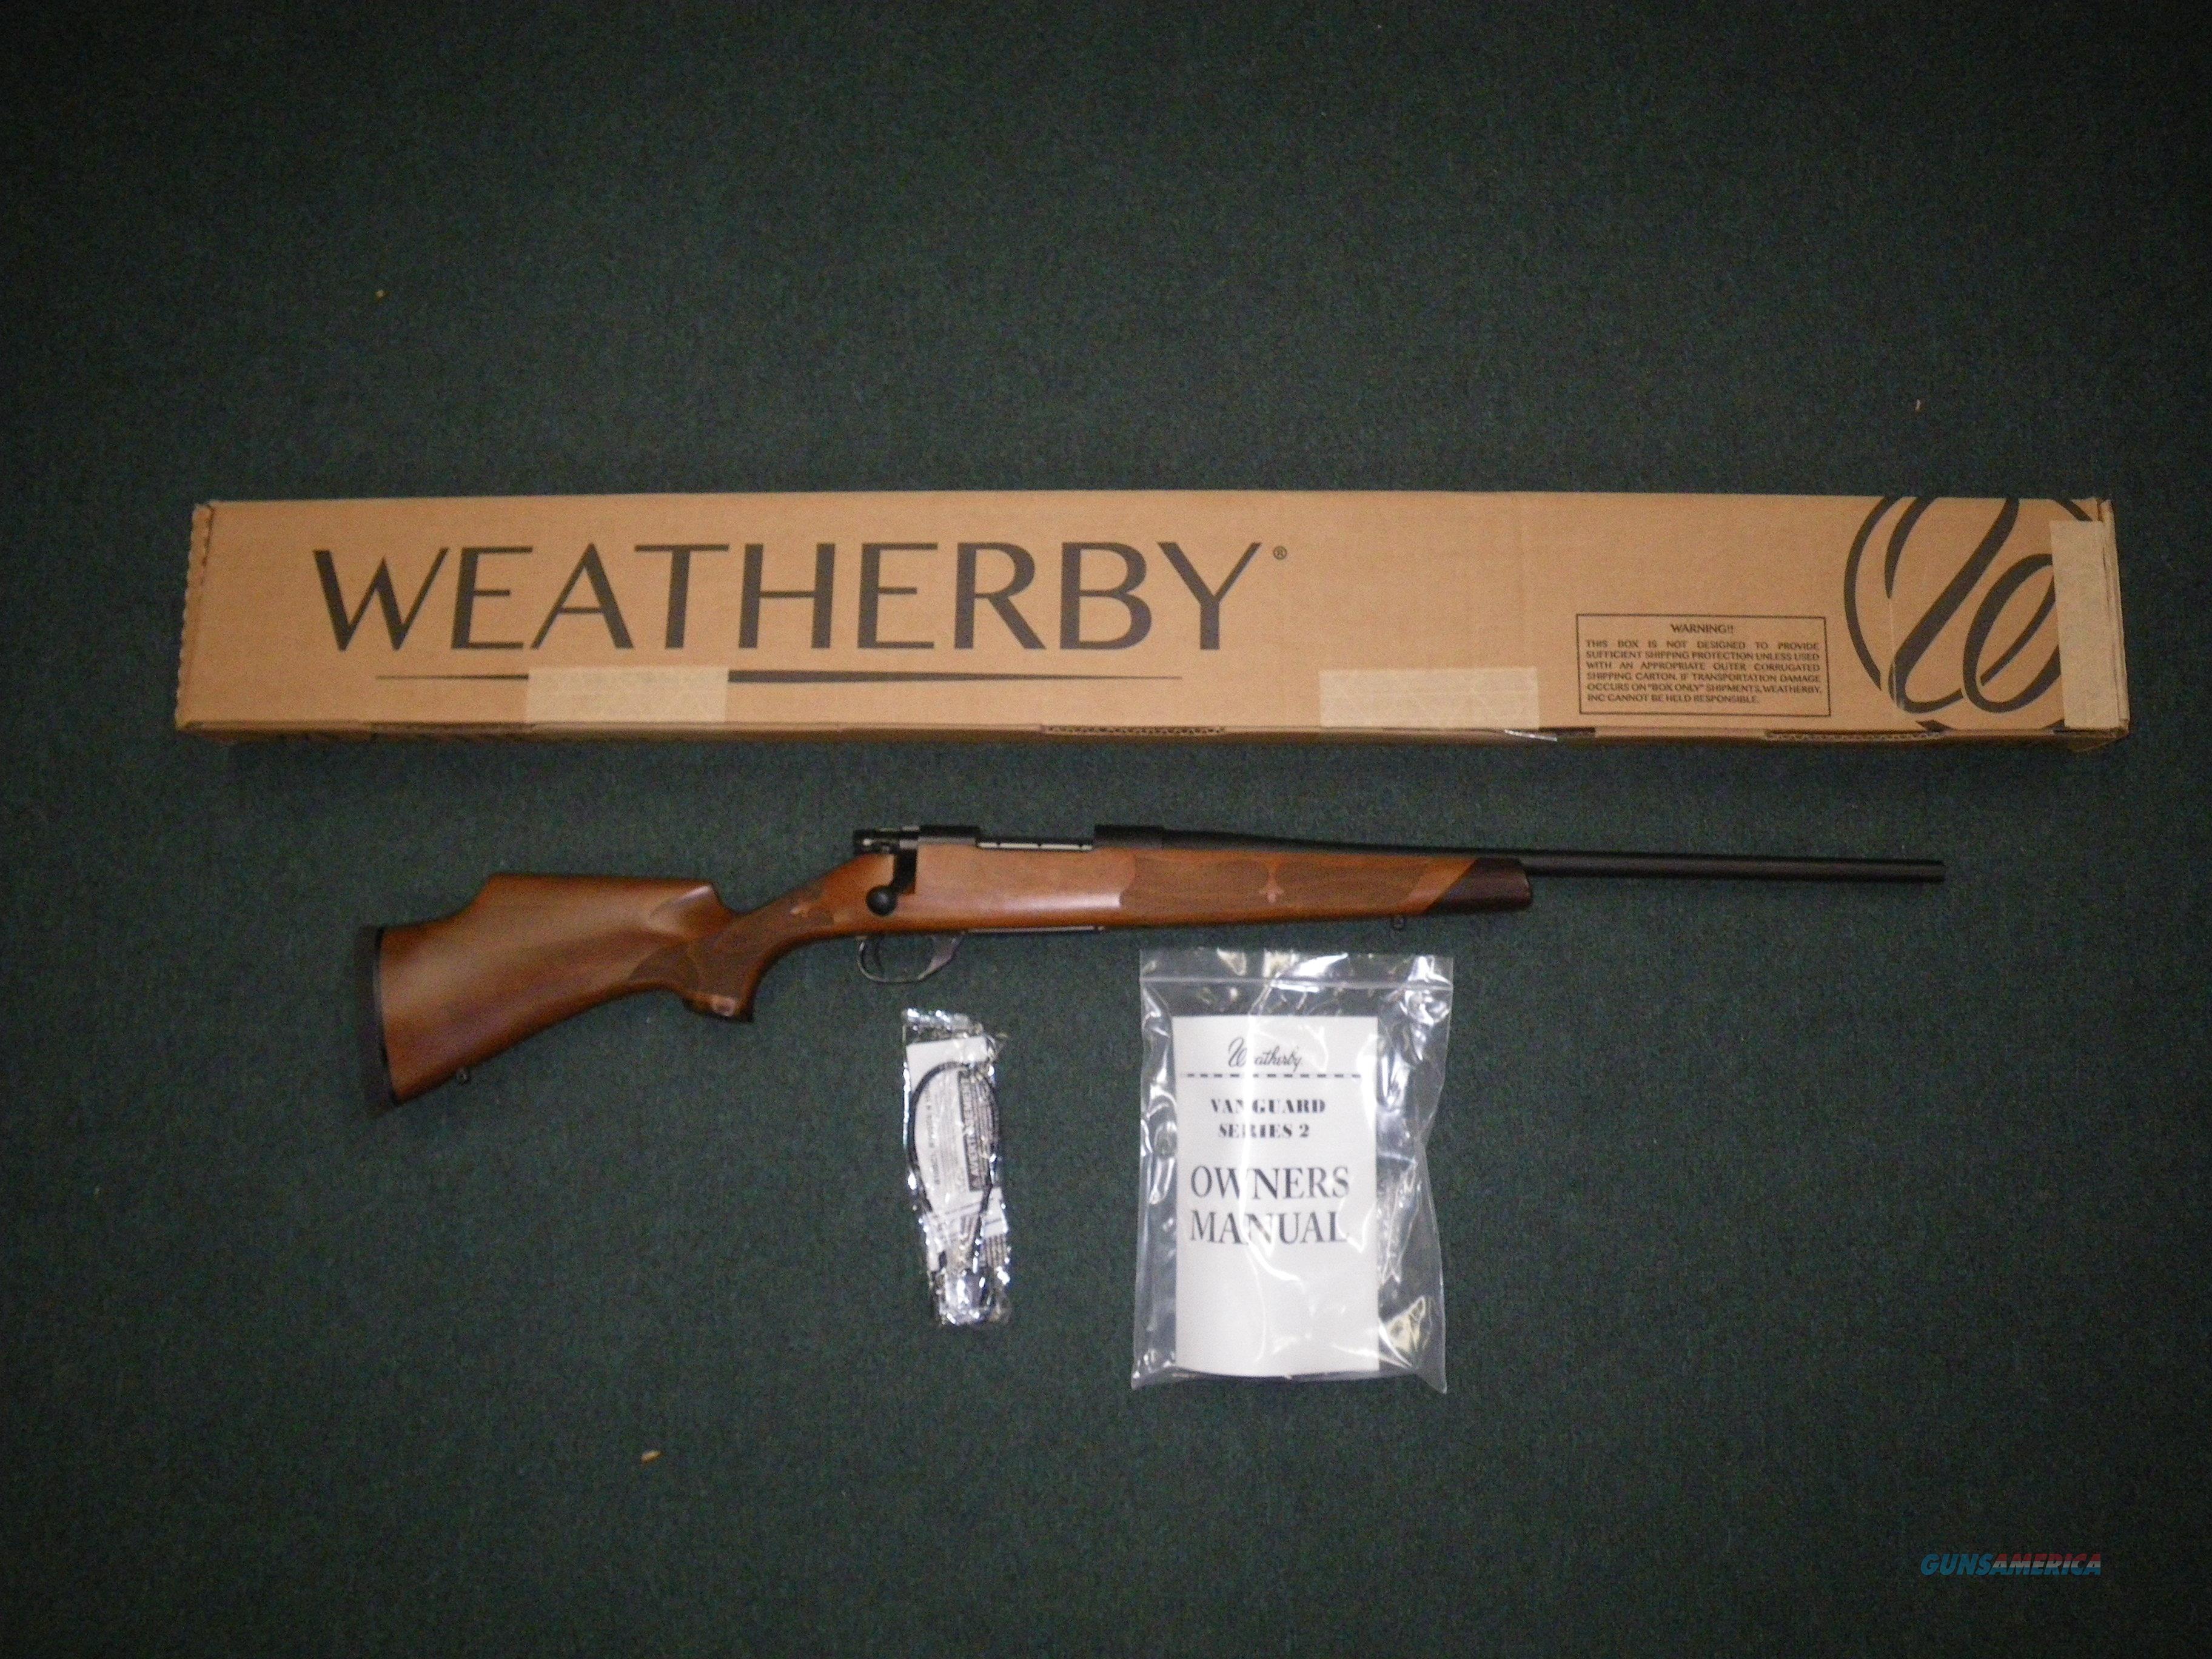 "Weatherby Vangaurd Camilla 6.5 Creedmore 20"" NEW VWR65CMR0O  Guns > Rifles > Weatherby Rifles > Sporting"